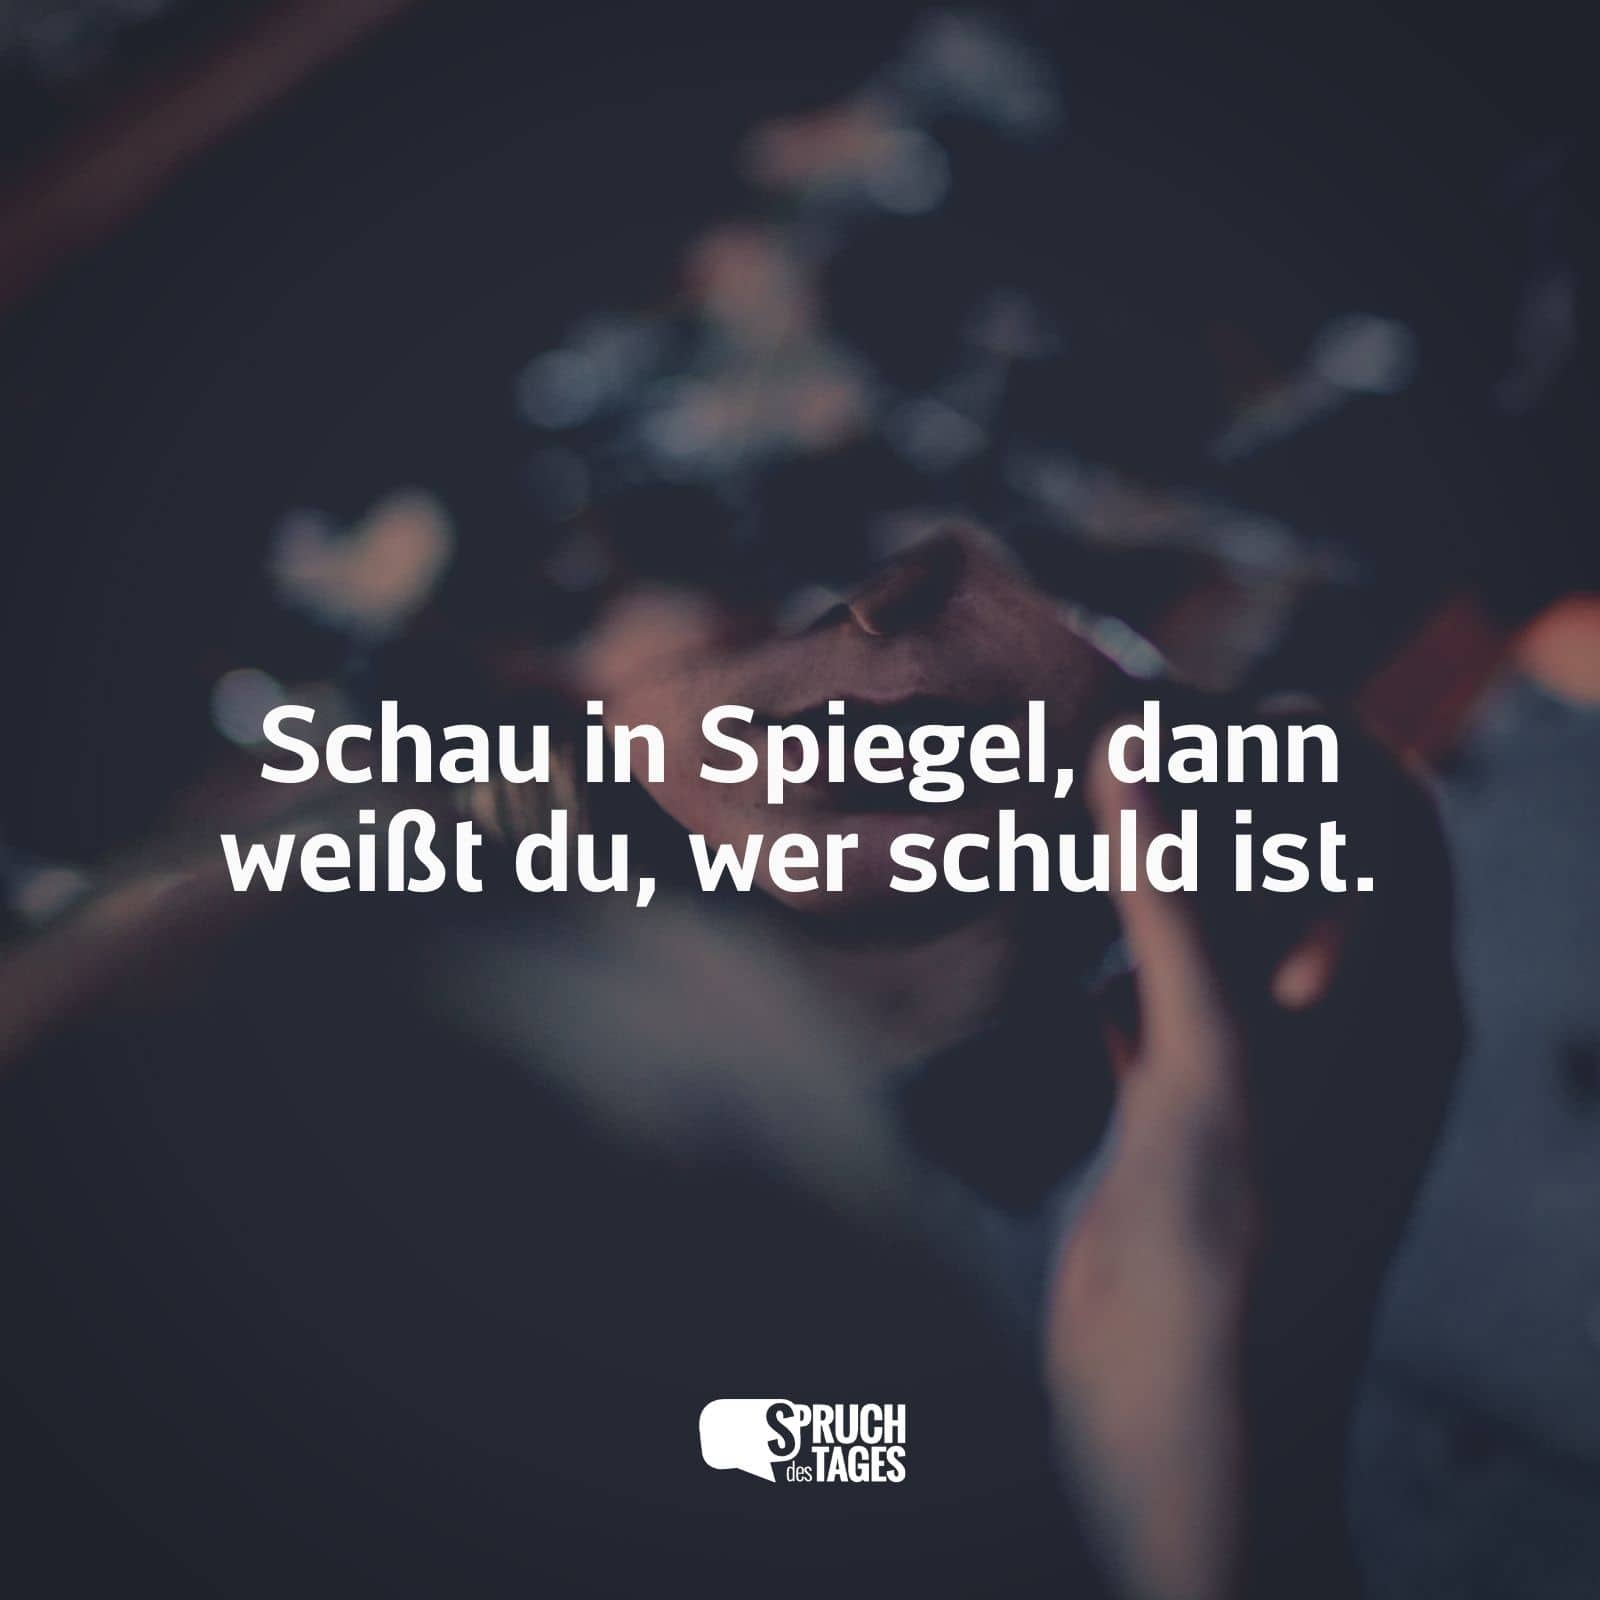 The memorandum Sprüche Selber Schuld the wake